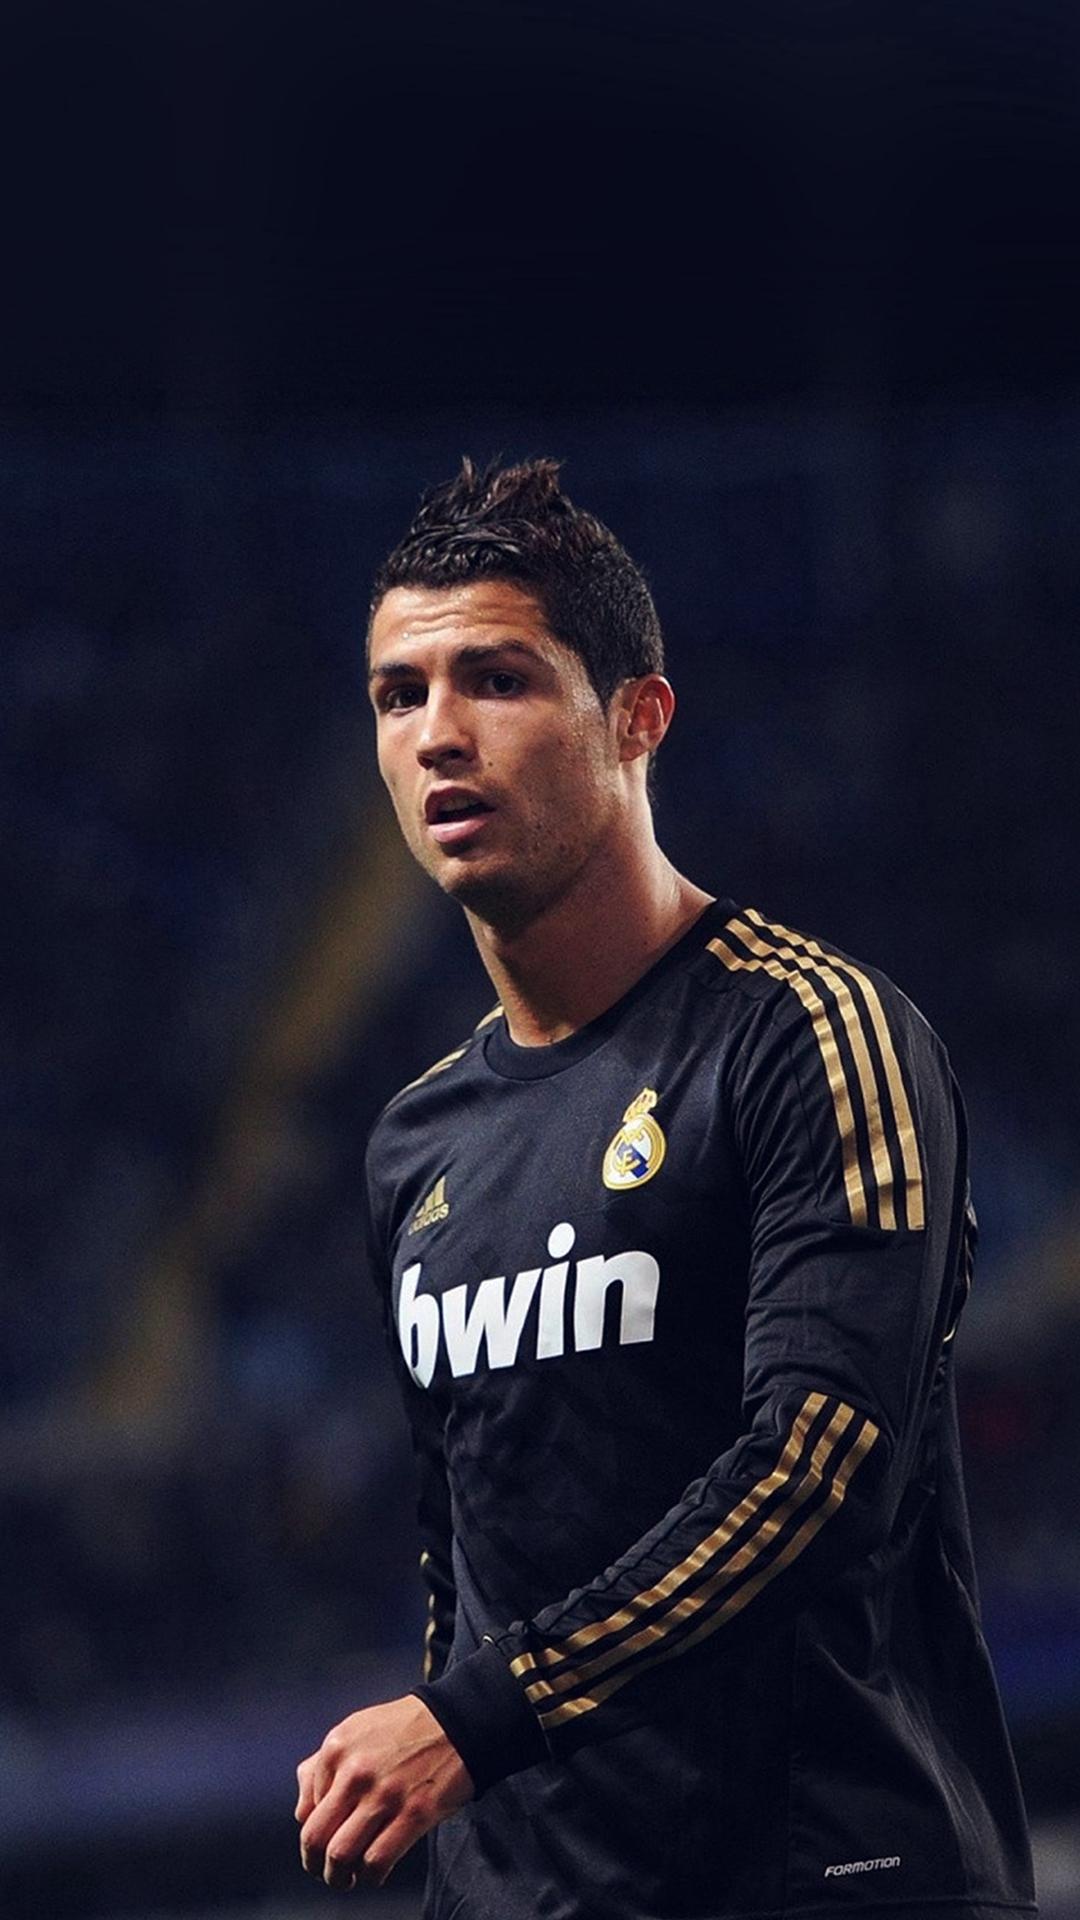 Ronaldo Christiano Soccer Star Iphone 6 Wallpaper - Cristiano Ronaldo Real Madrid 2012 , HD Wallpaper & Backgrounds